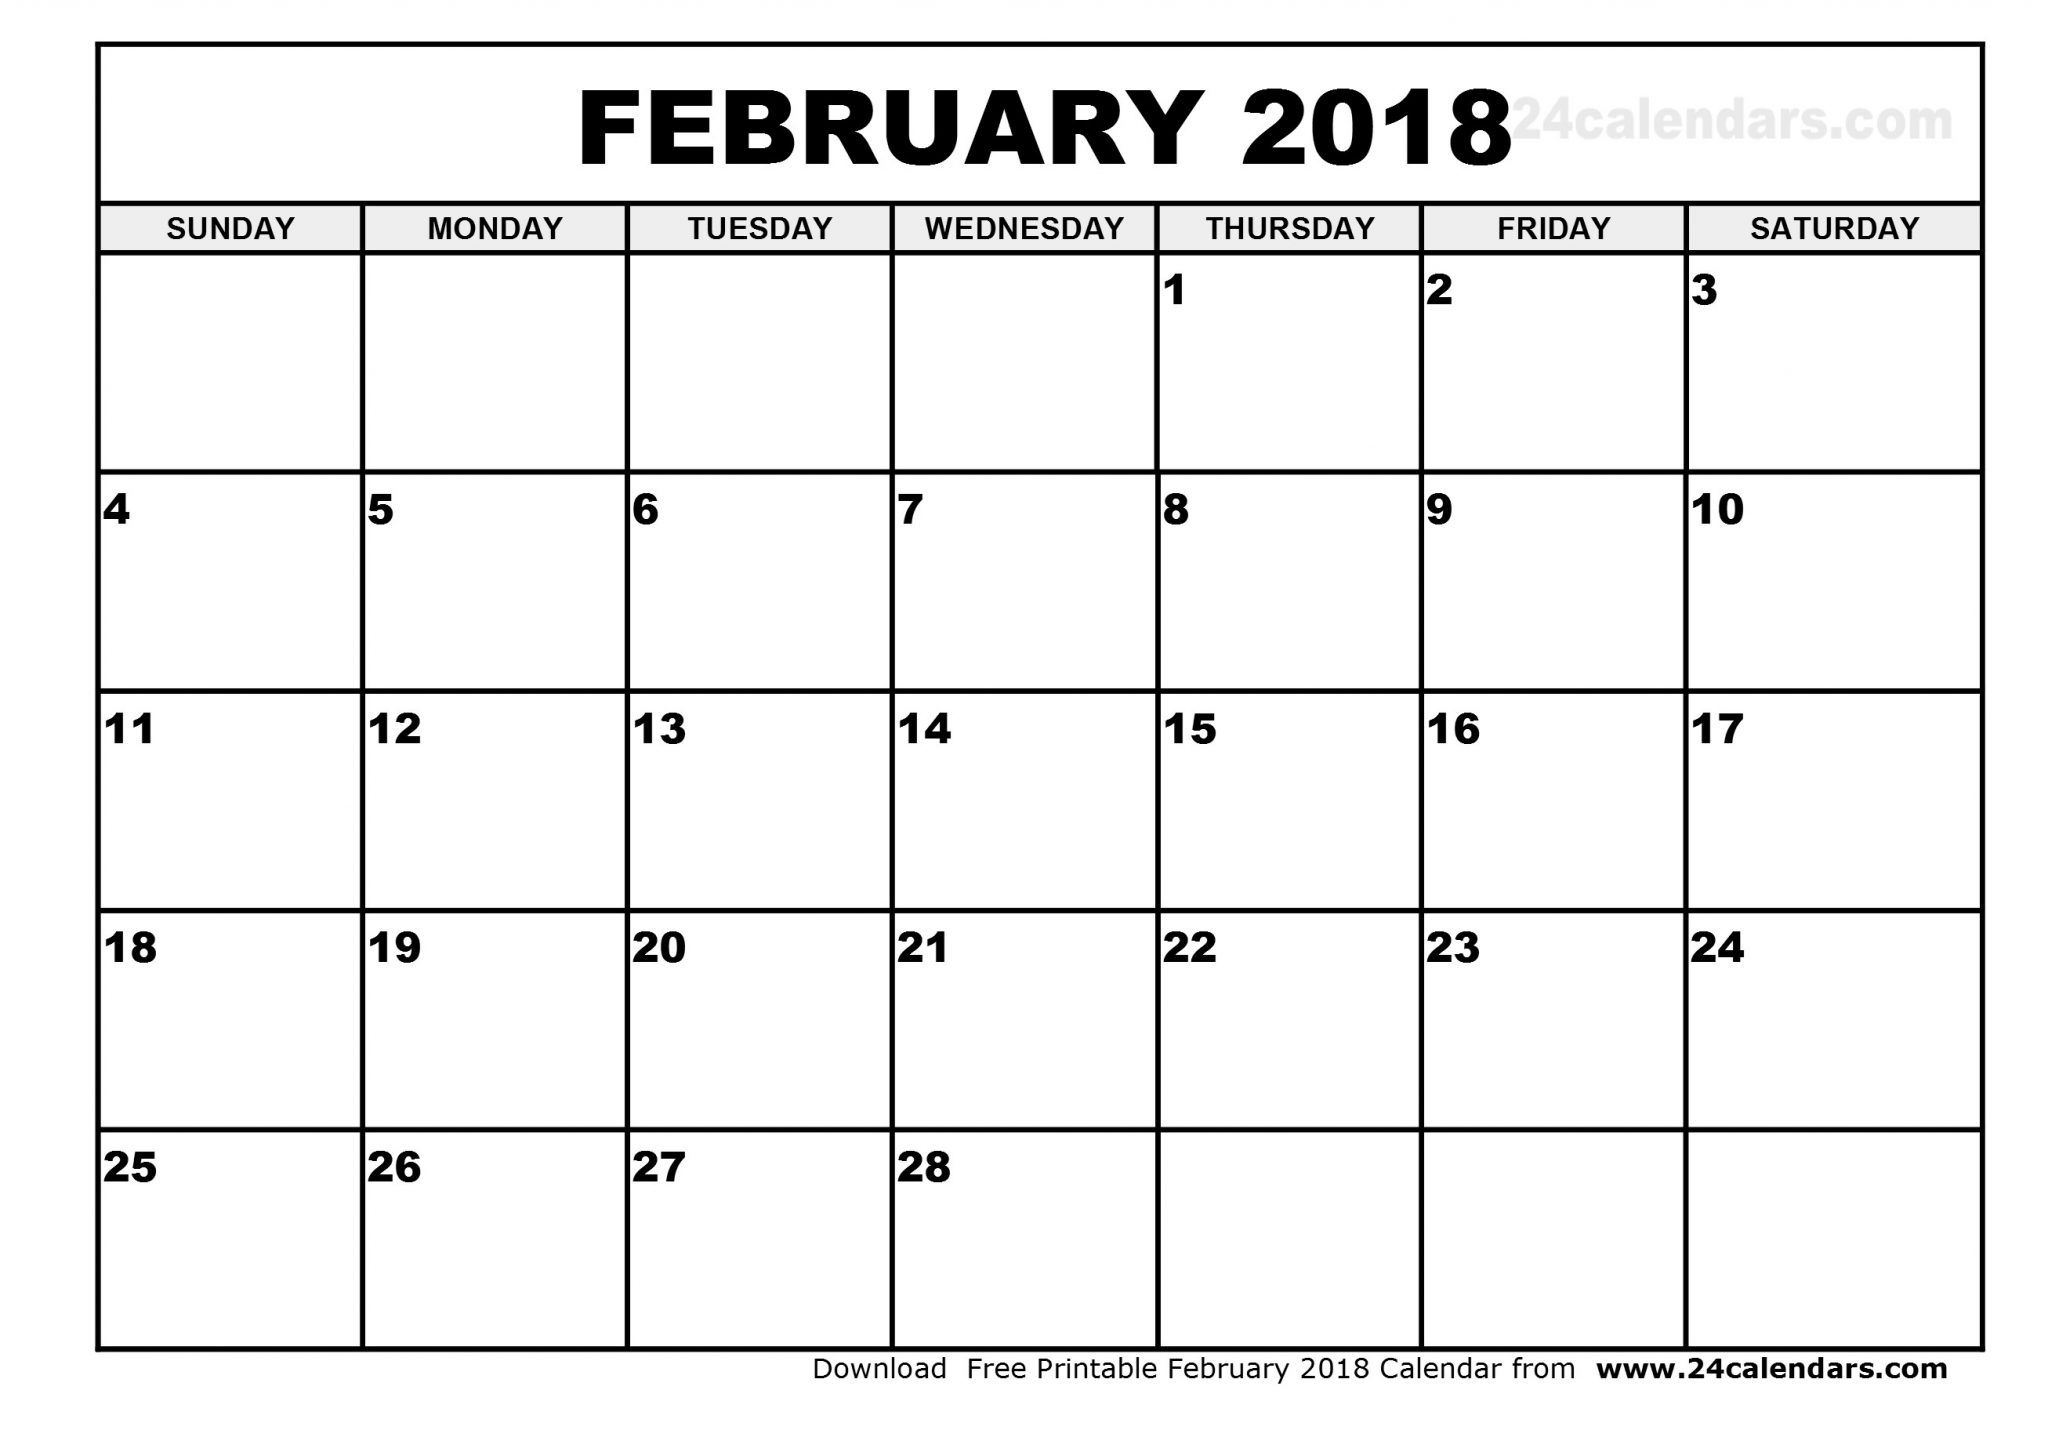 Blank February 2019 Calendar Printable   Free Printable February with regard to Free Printable September Blank Calendars With Christian Themes